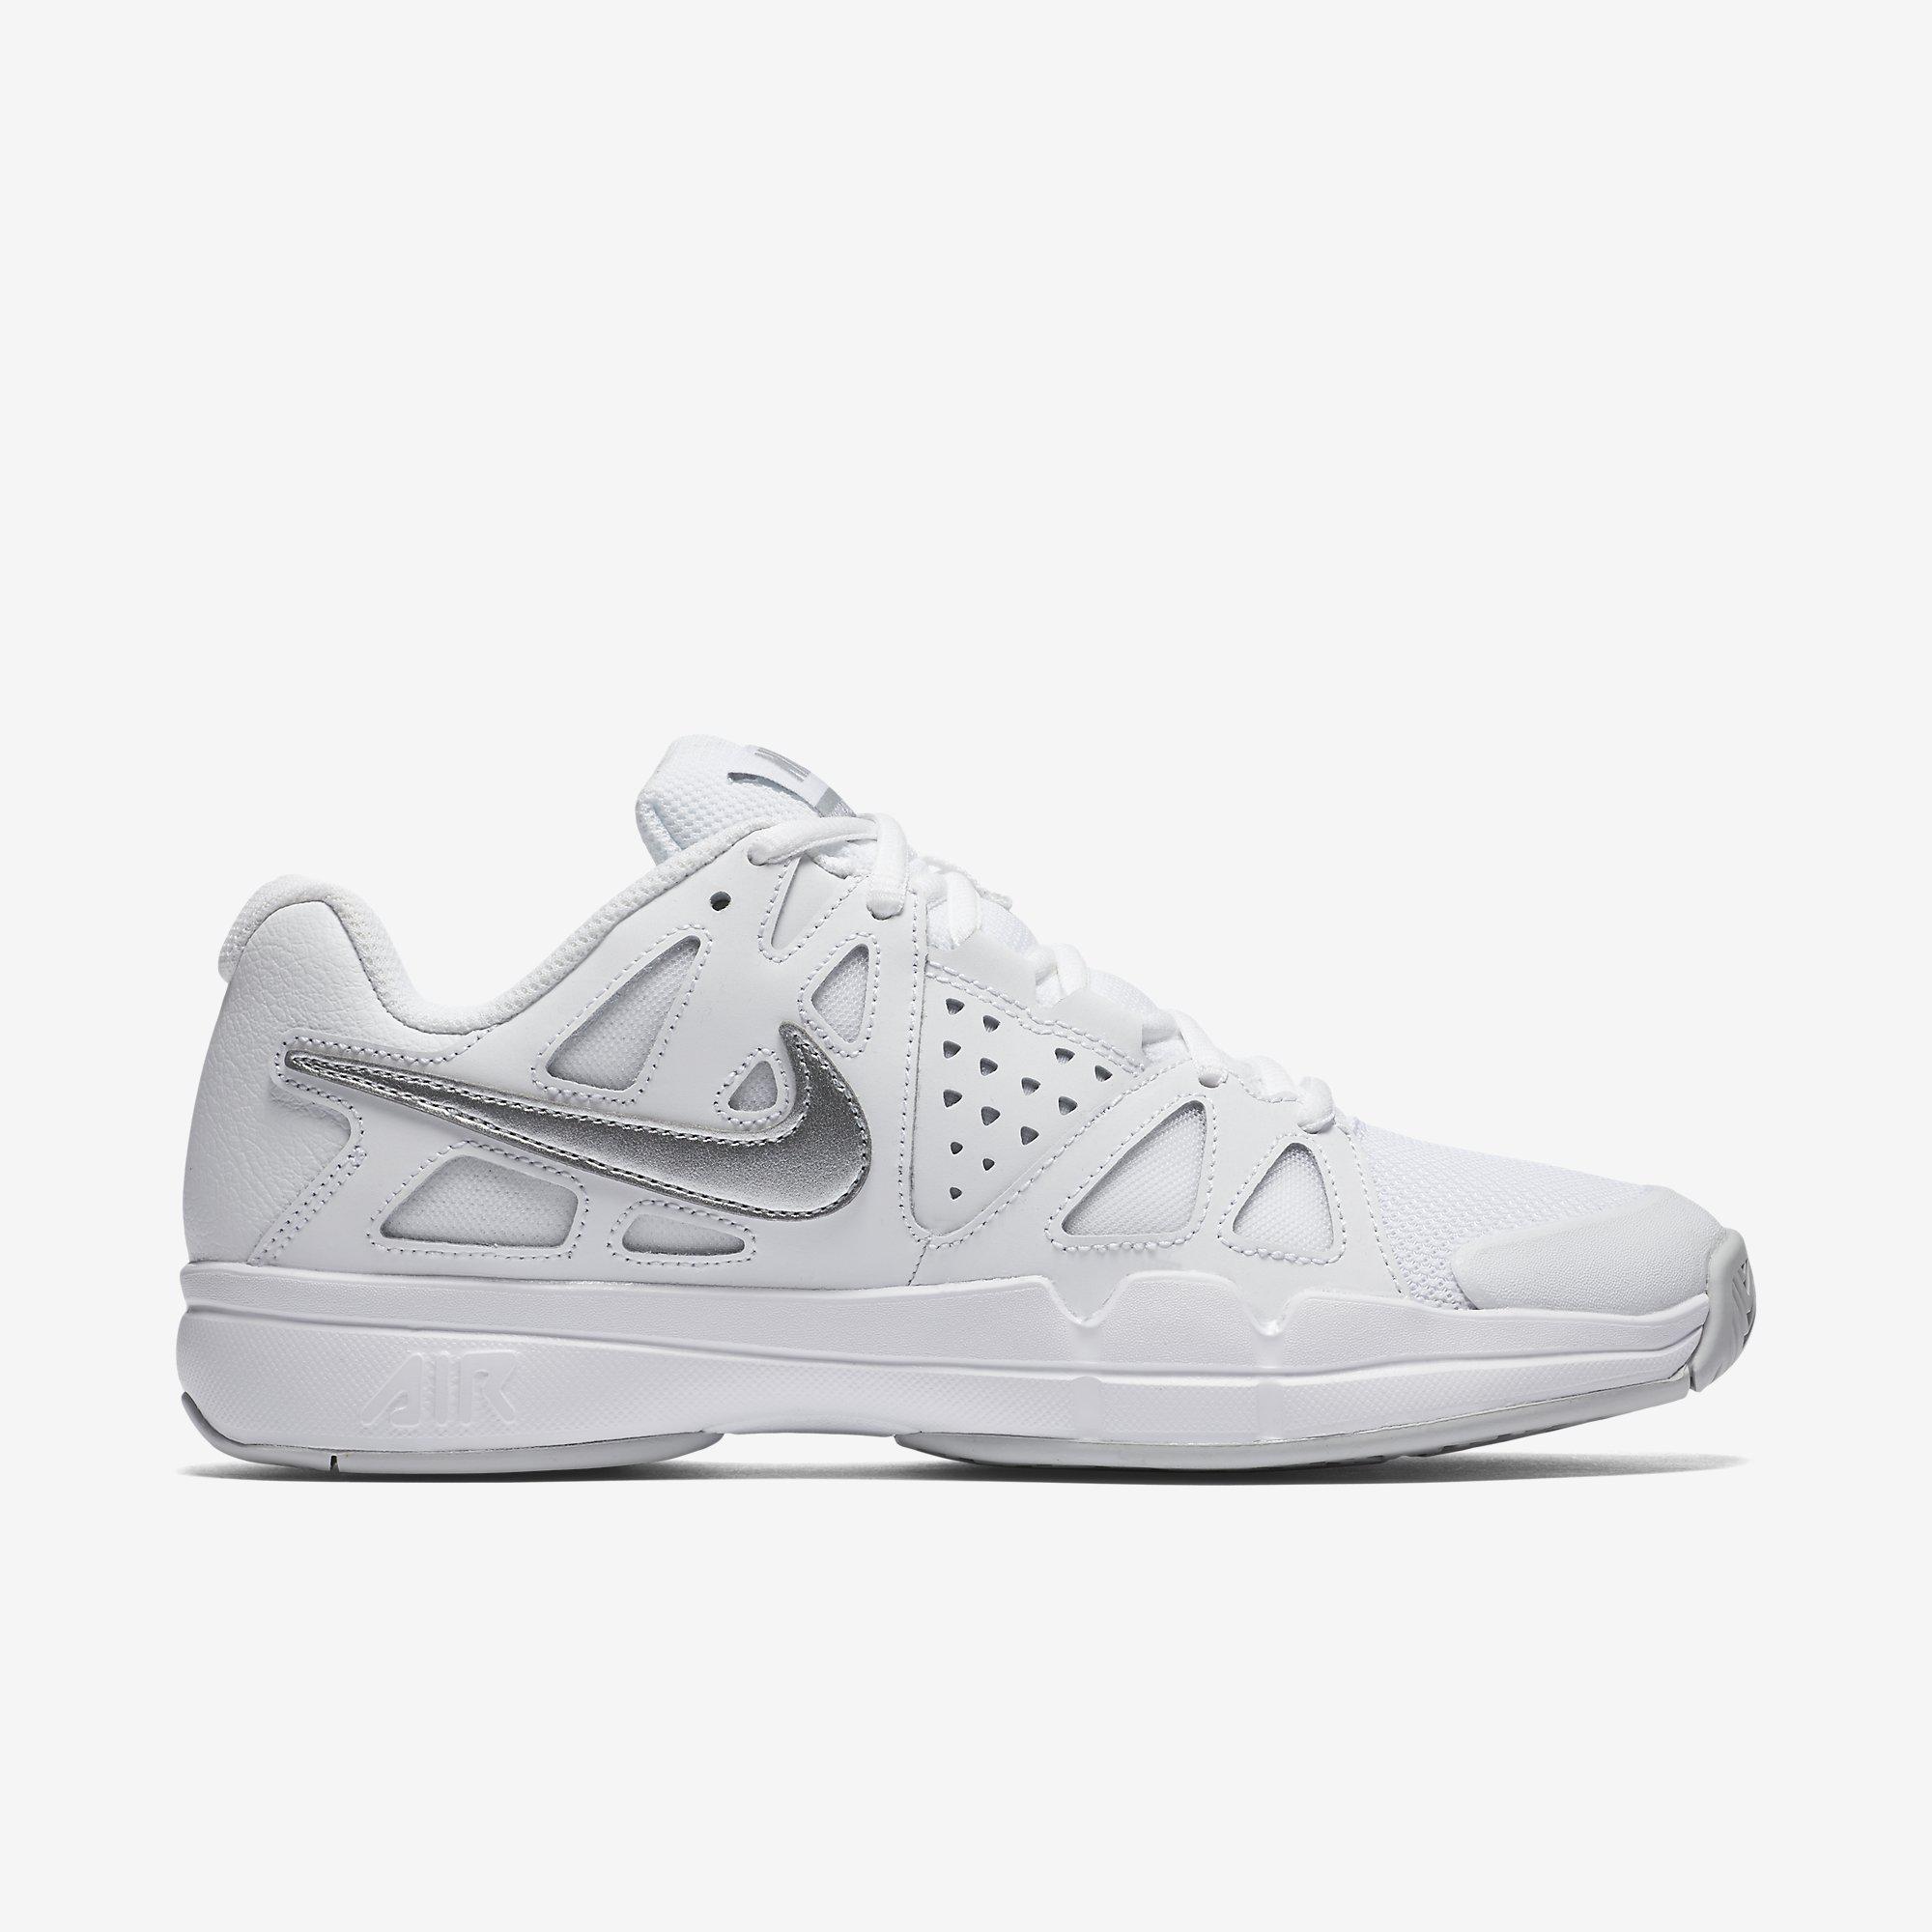 b633dee72201 Nike Womens Air Vapor Advantage Tennis Shoes - White - Tennisnuts.com